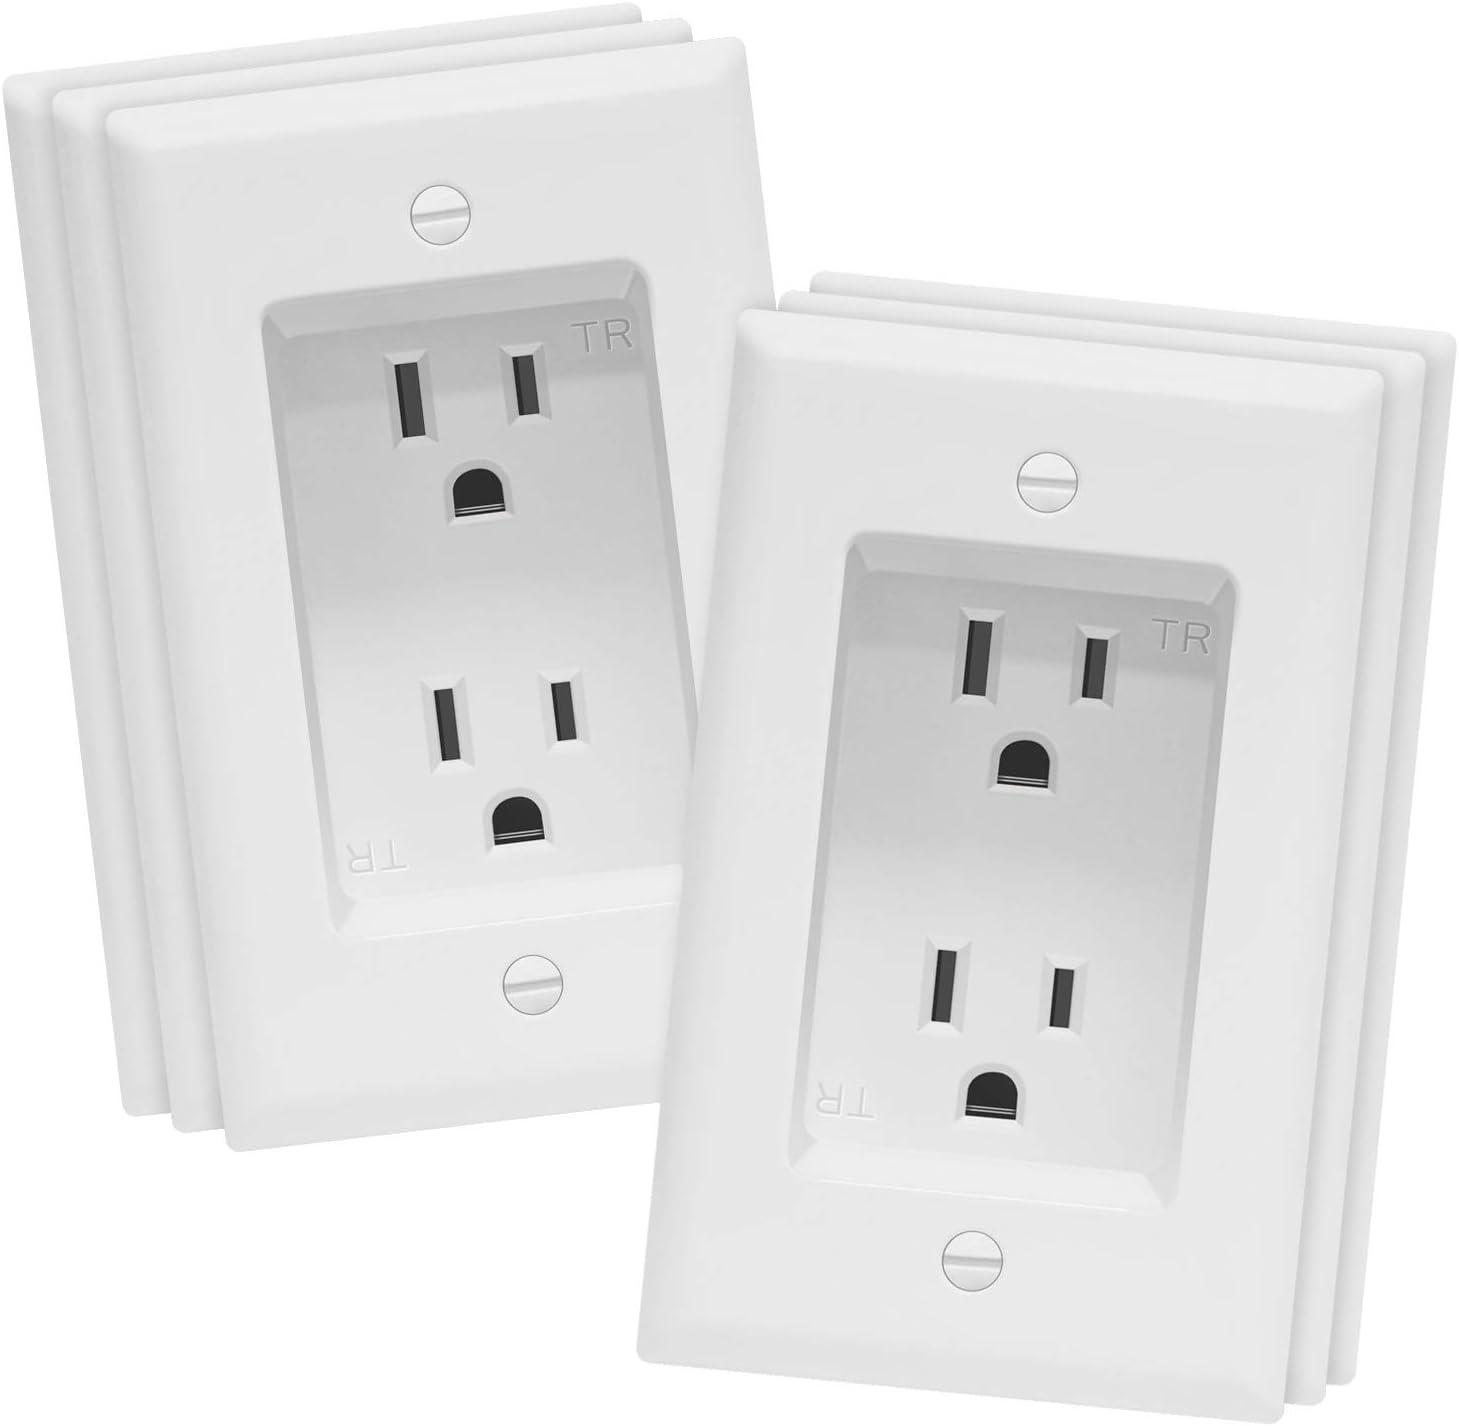 "TOPGREENER Recessed Duplex Receptacle Outlet, Tamper-Resistant, Size 1-Gang 4.48"" x 2.76"", 15A 125V, TG15RD31-6PCS, White (6 Pack)"